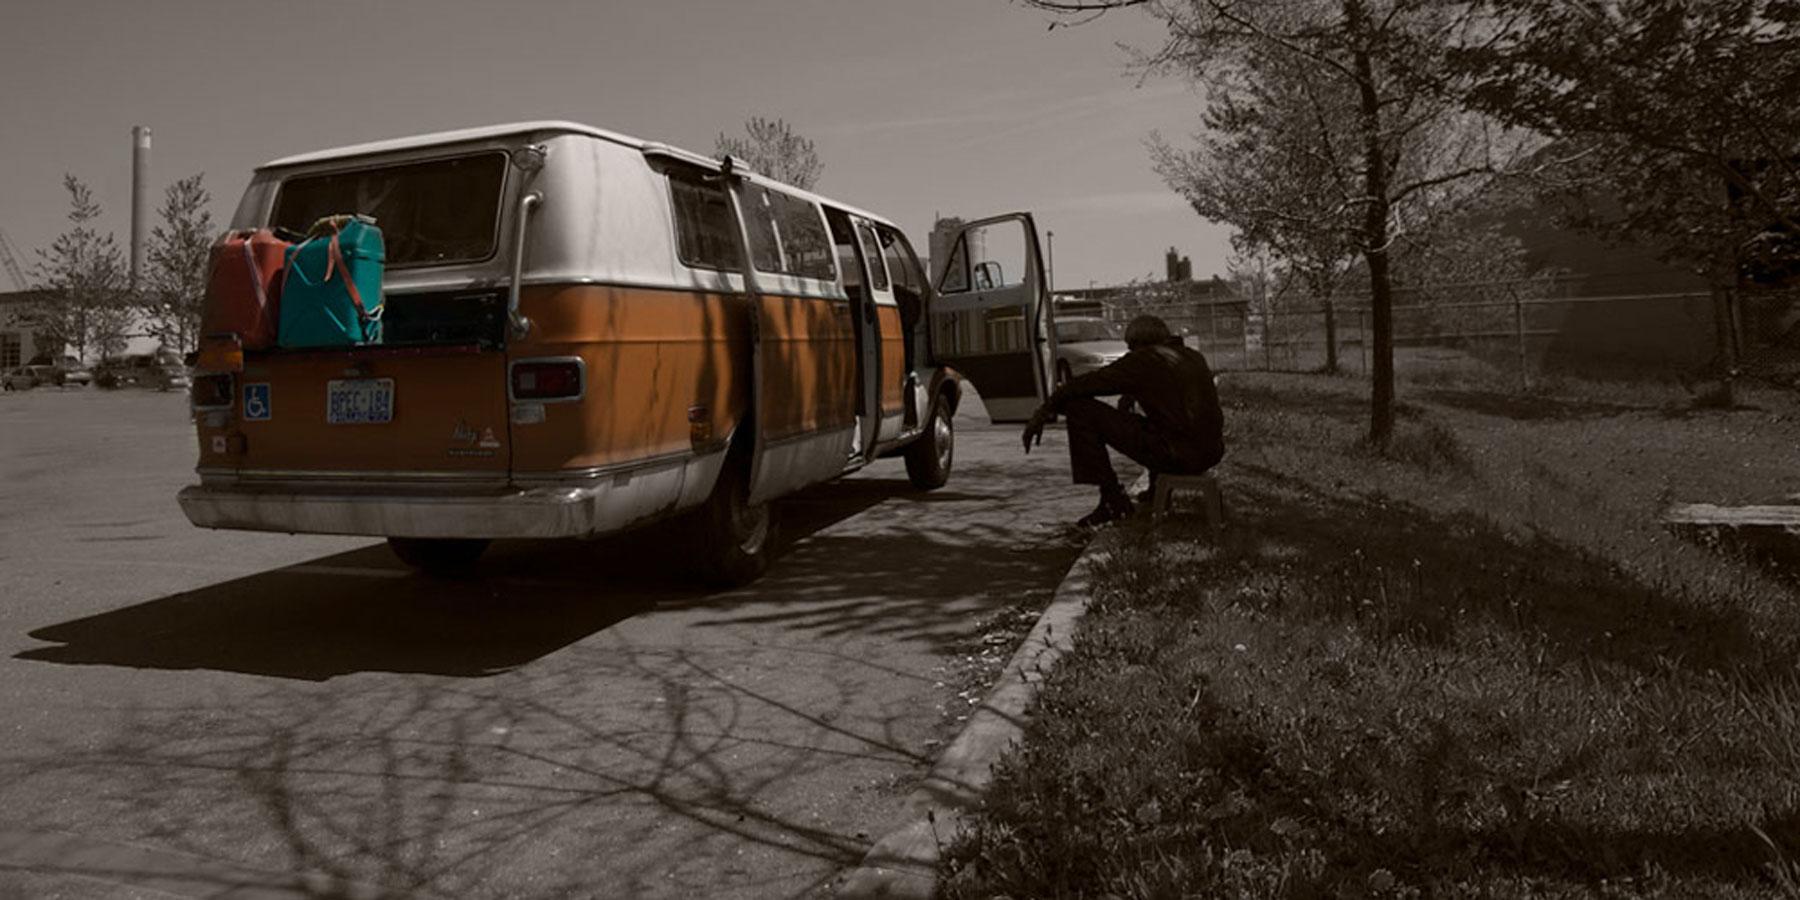 city-parks-2014_048-VW-Van-Mohammed-web-slides